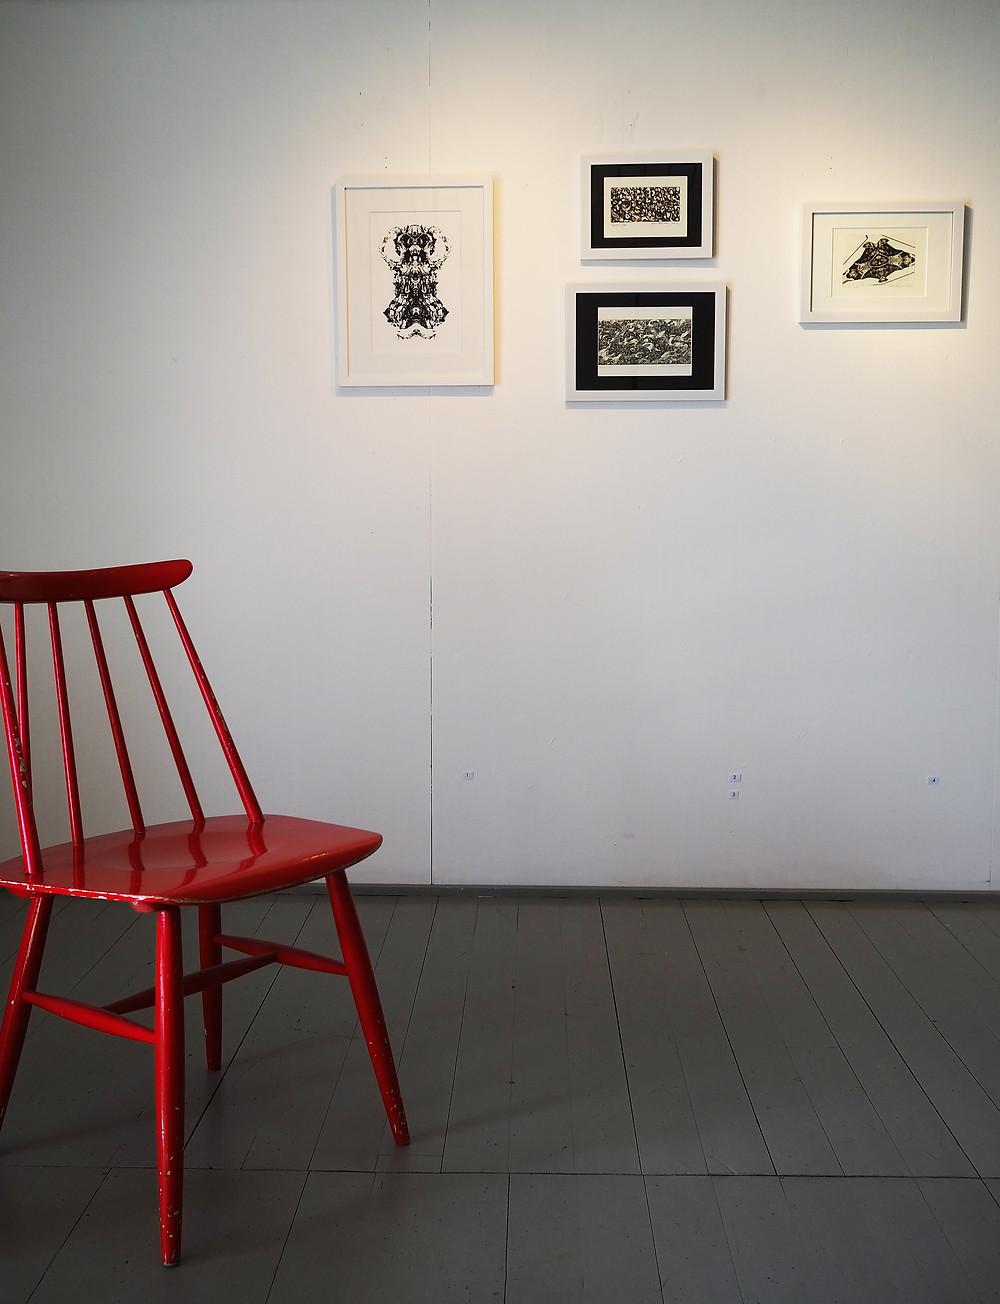 Korpilahti galleria